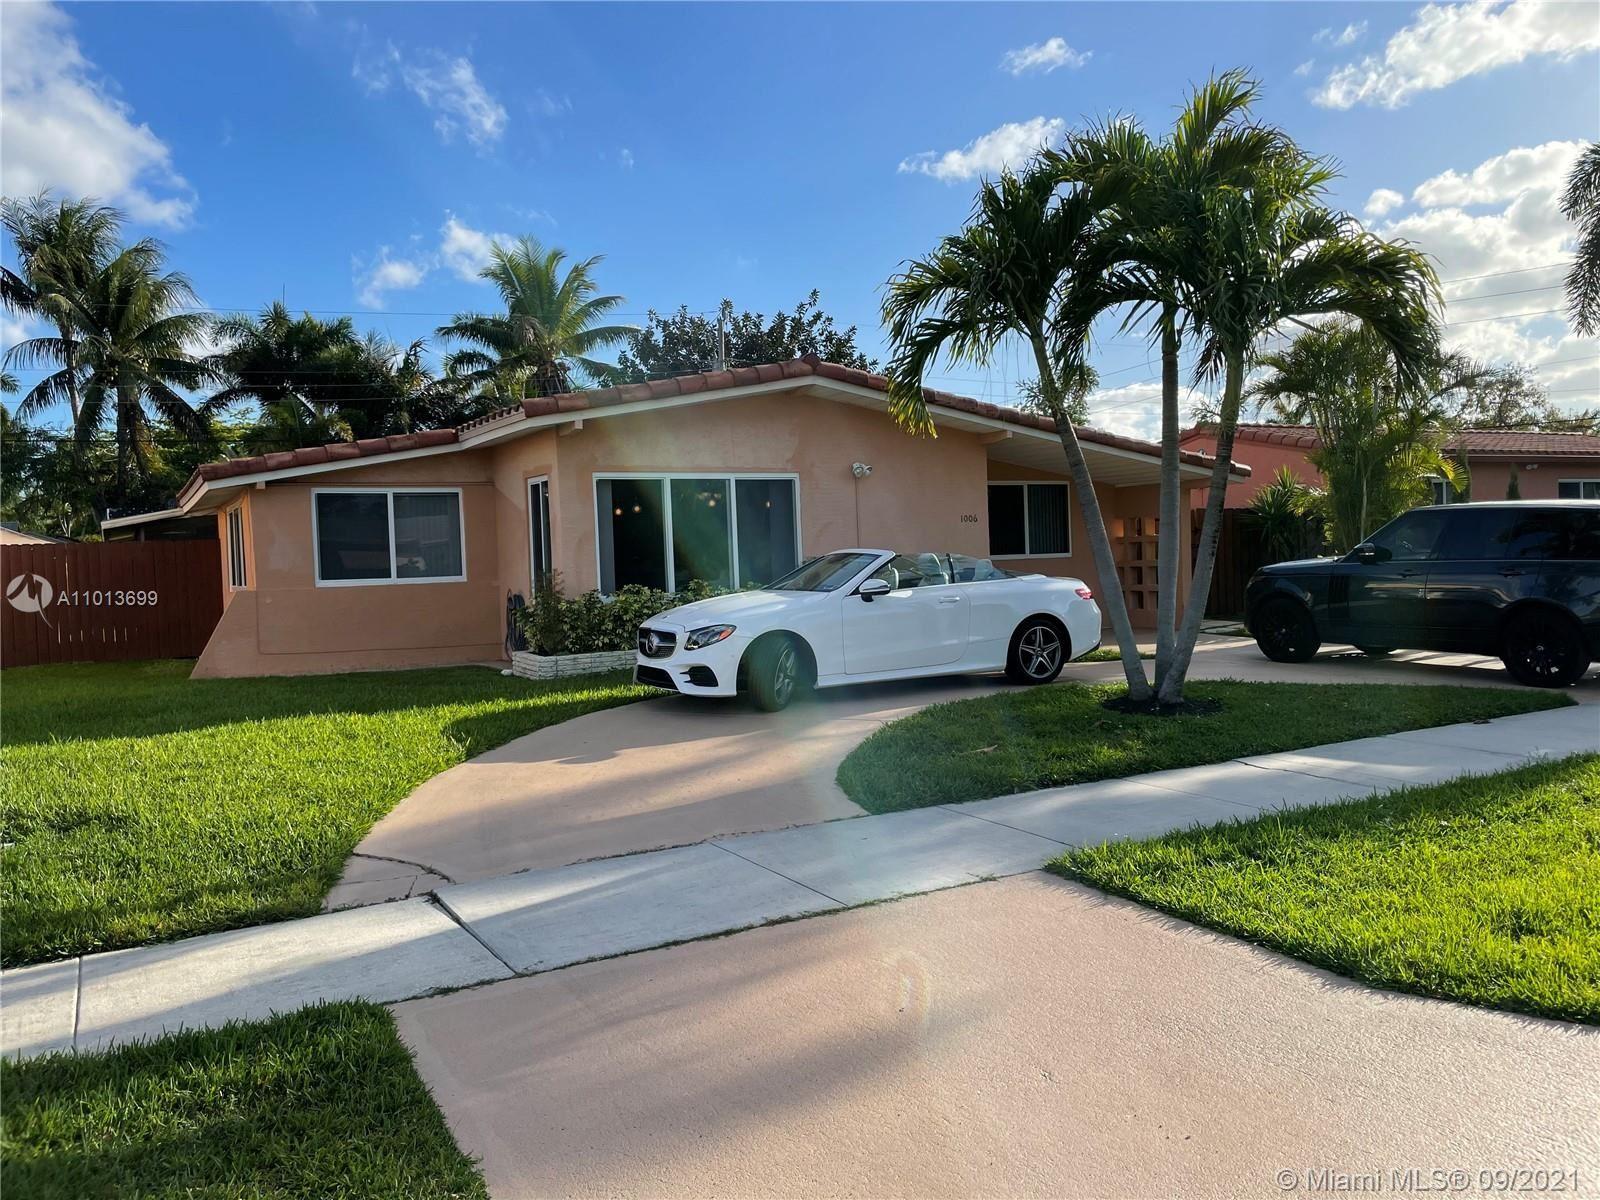 1006 NE 6th St, Hallandale Beach, FL 33009 - #: A11013699